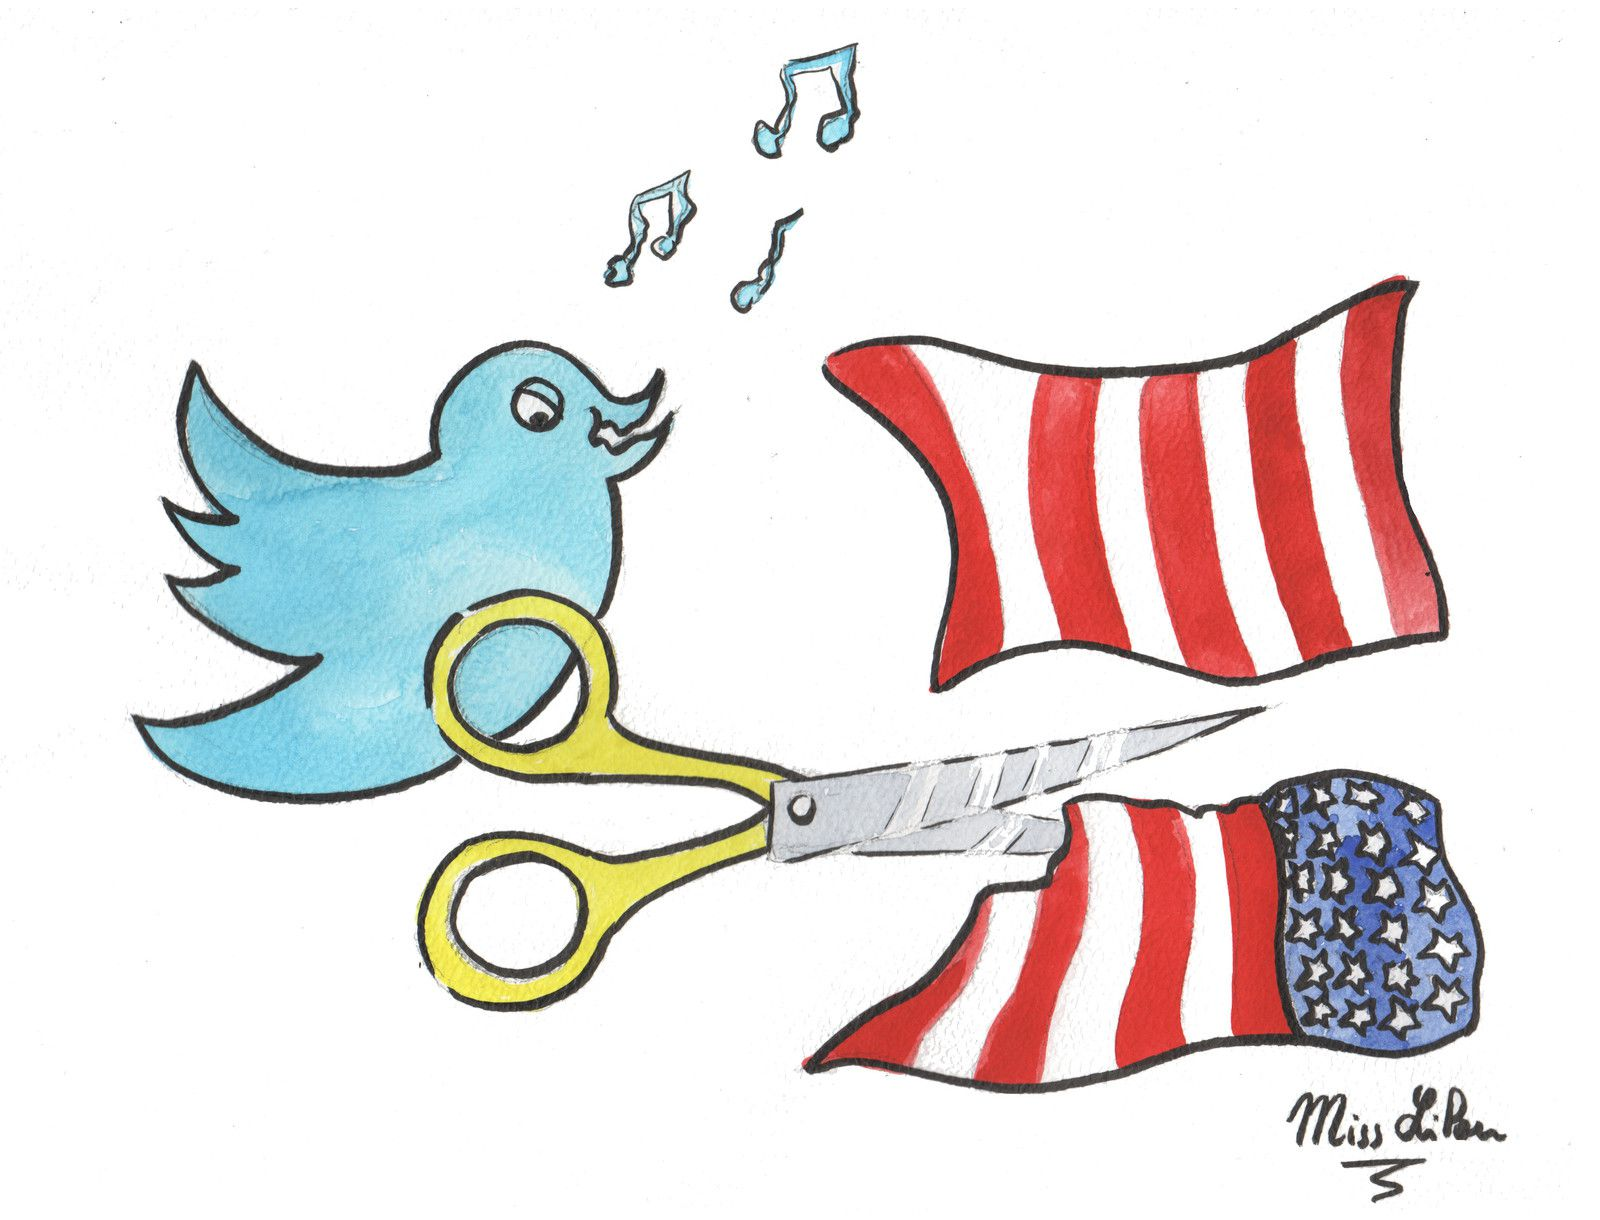 """Twitter : la censure"""